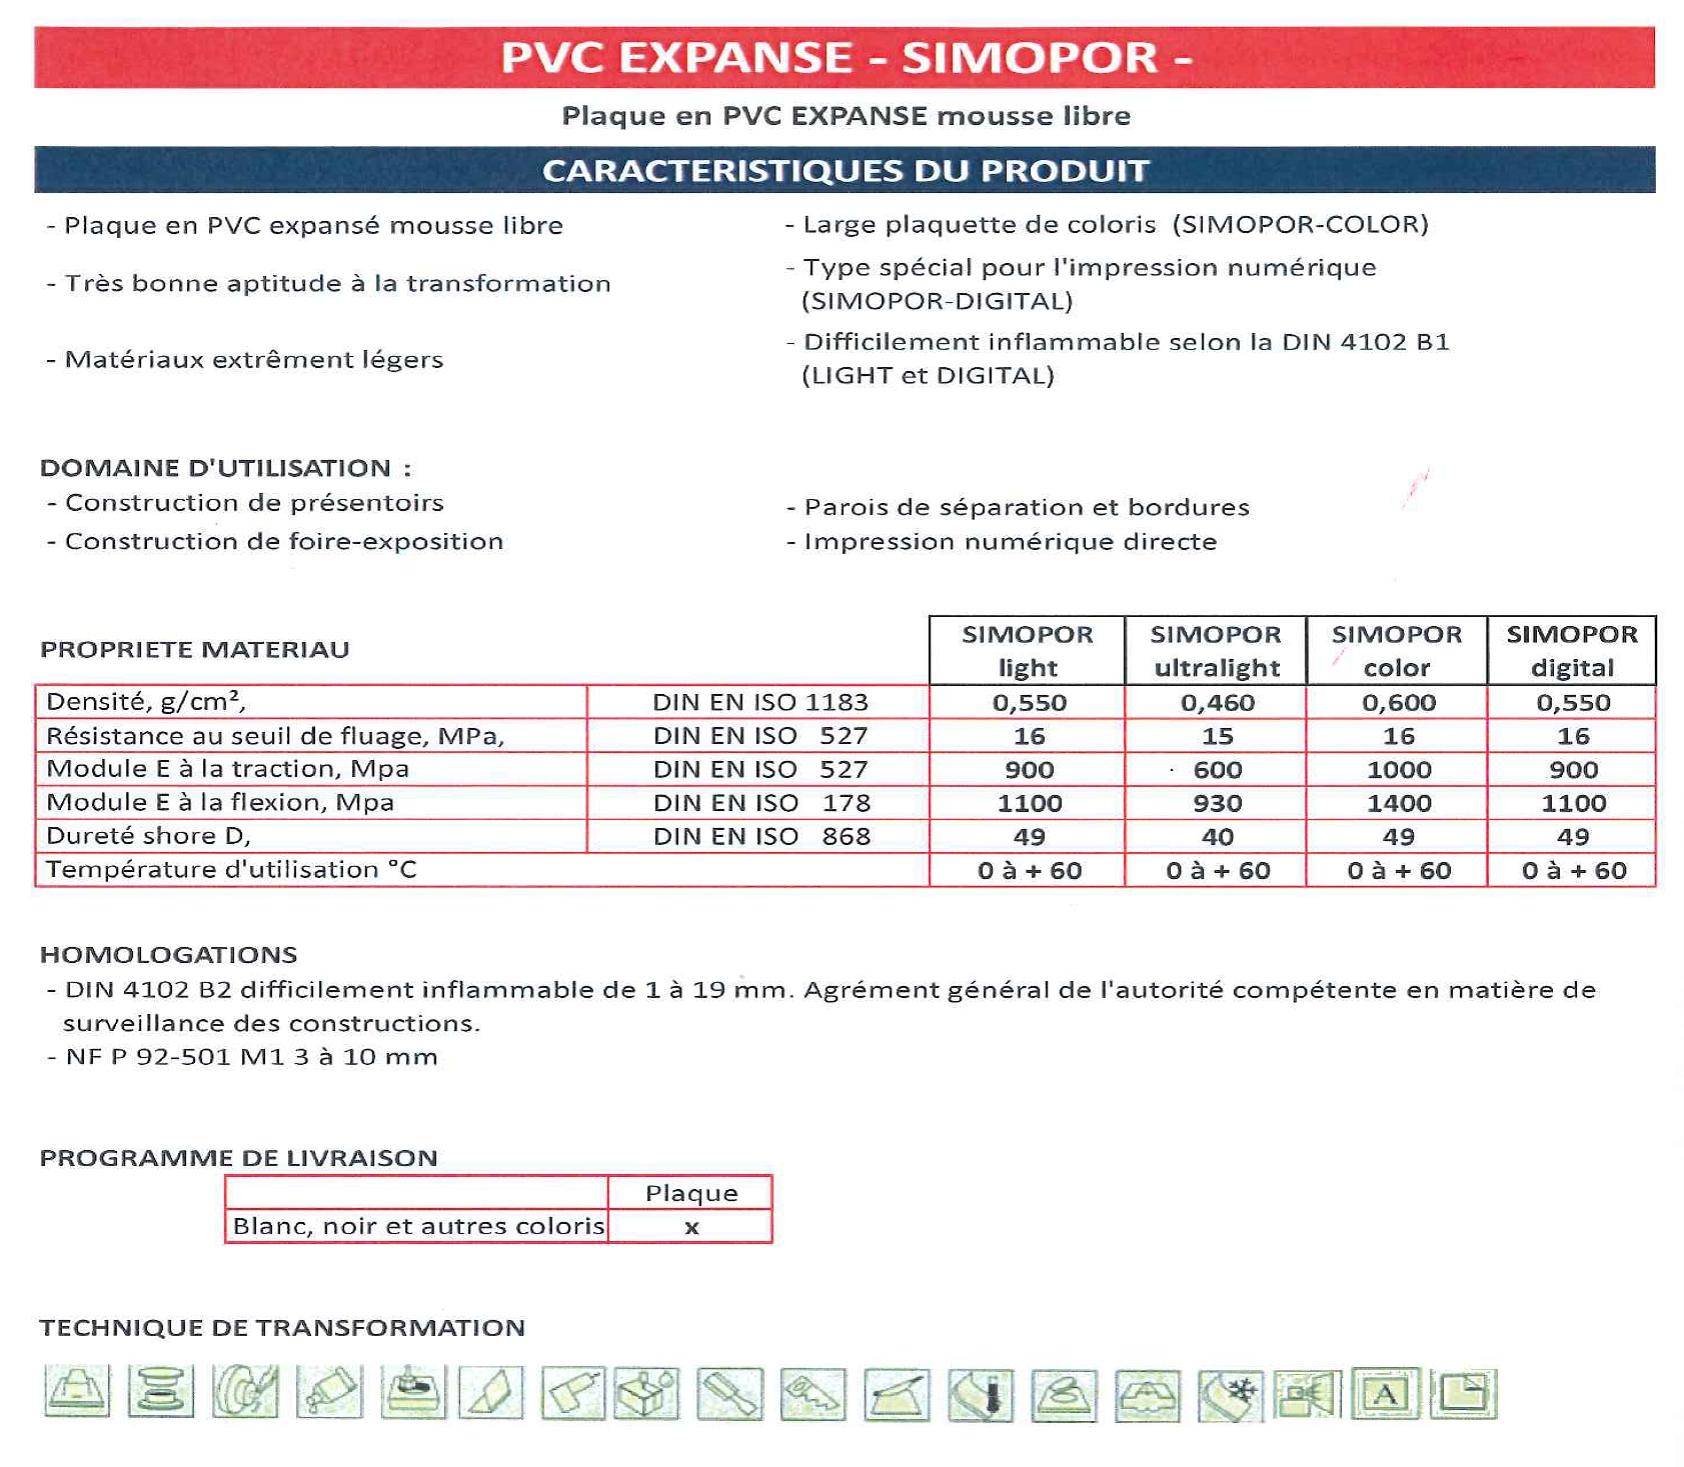 8. PVC EXPANSE